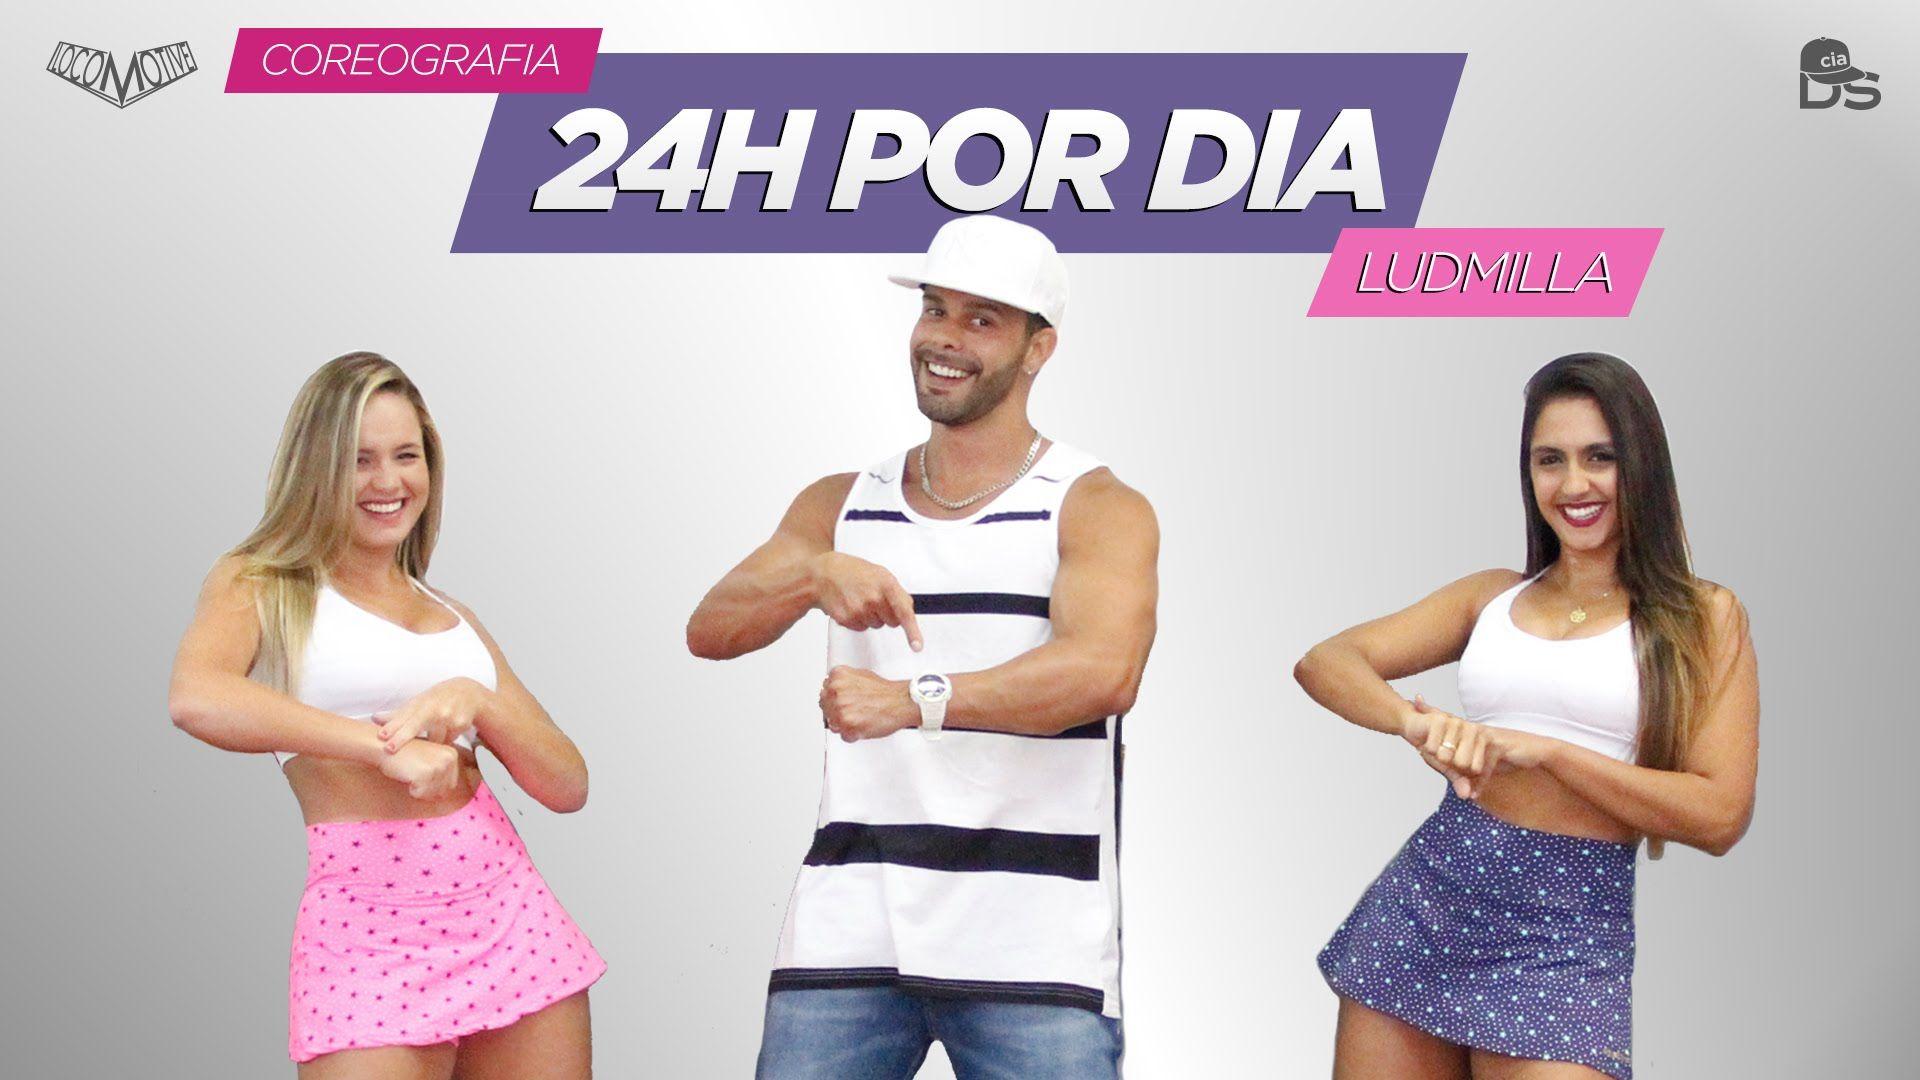 24 Horas Por Dia Ludmilla Cia Daniel Saboya Coreografia